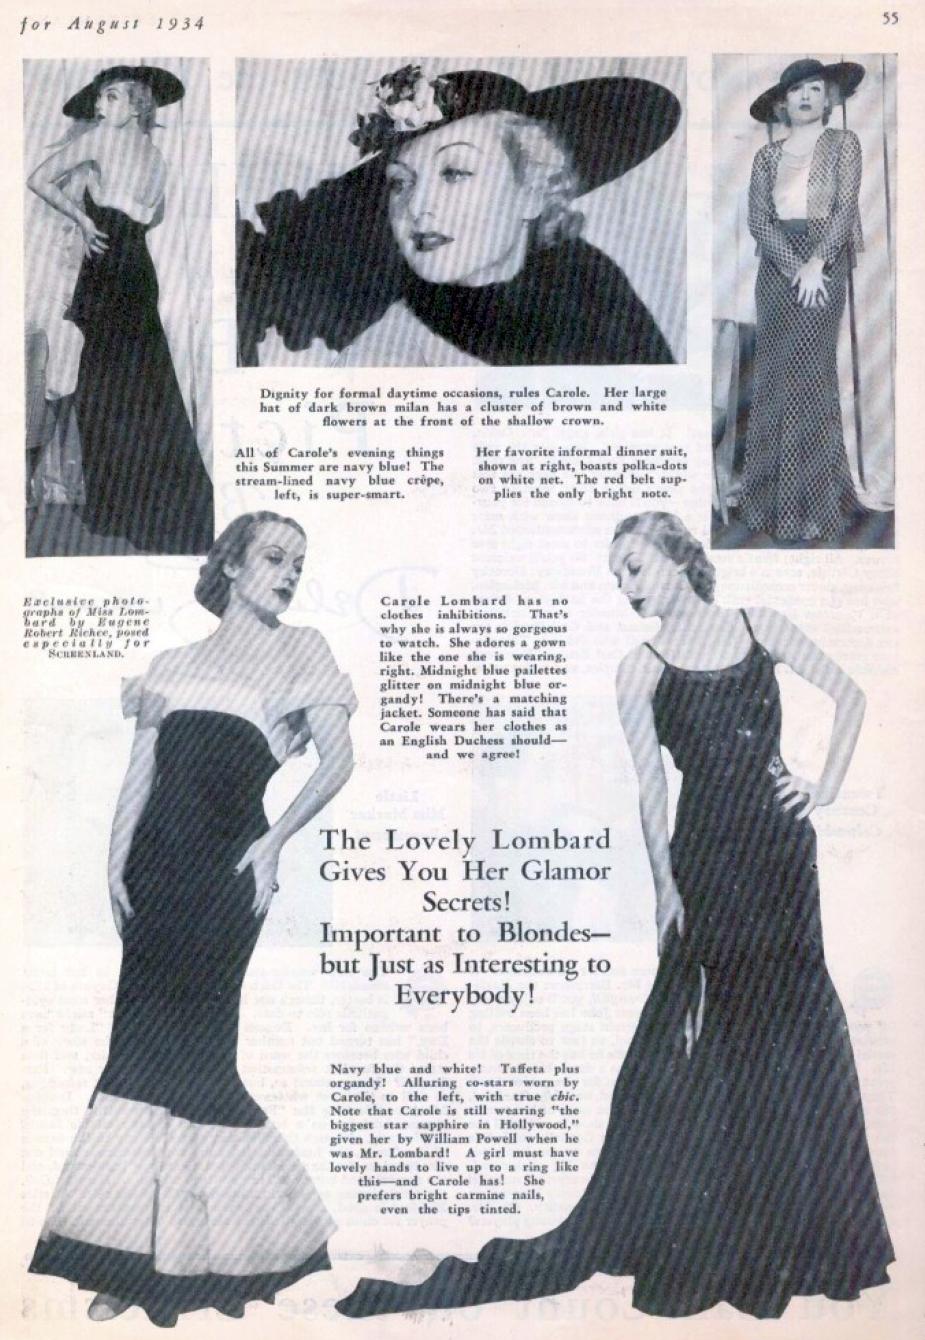 carole lombard screenland aug 1934 beauty 01a